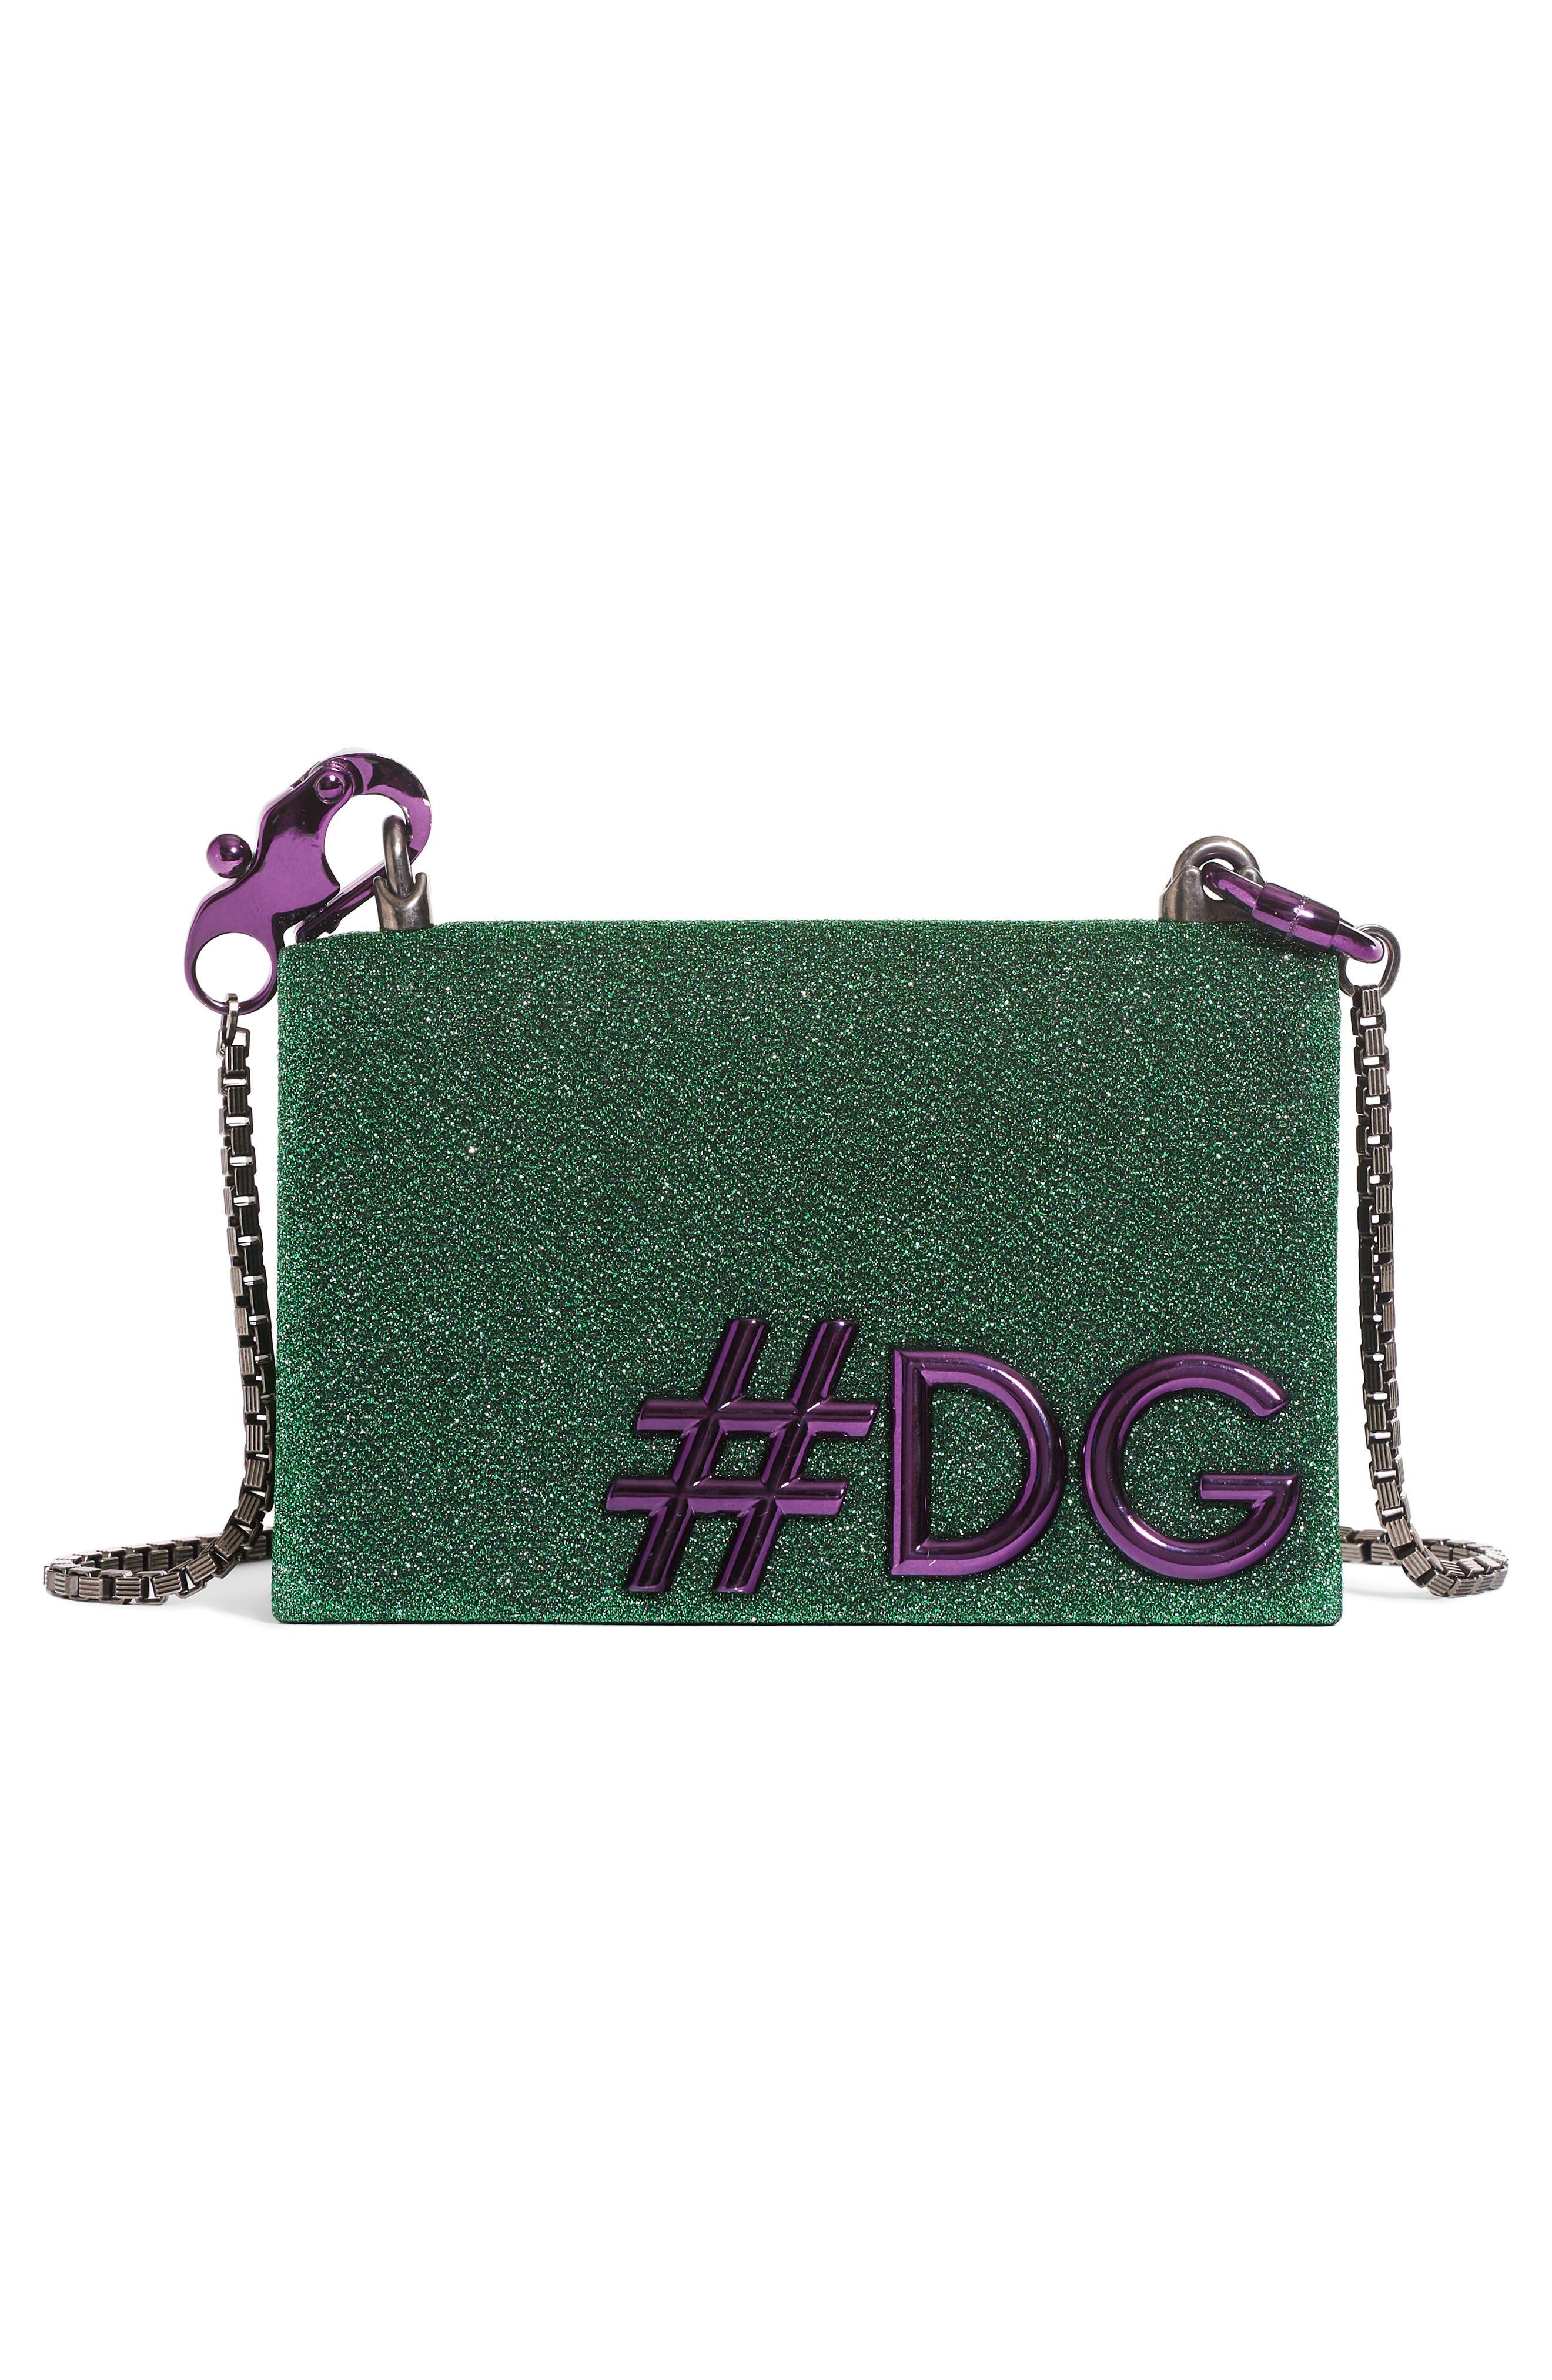 DG Girls Metallic Shoulder Bag,                             Alternate thumbnail 6, color,